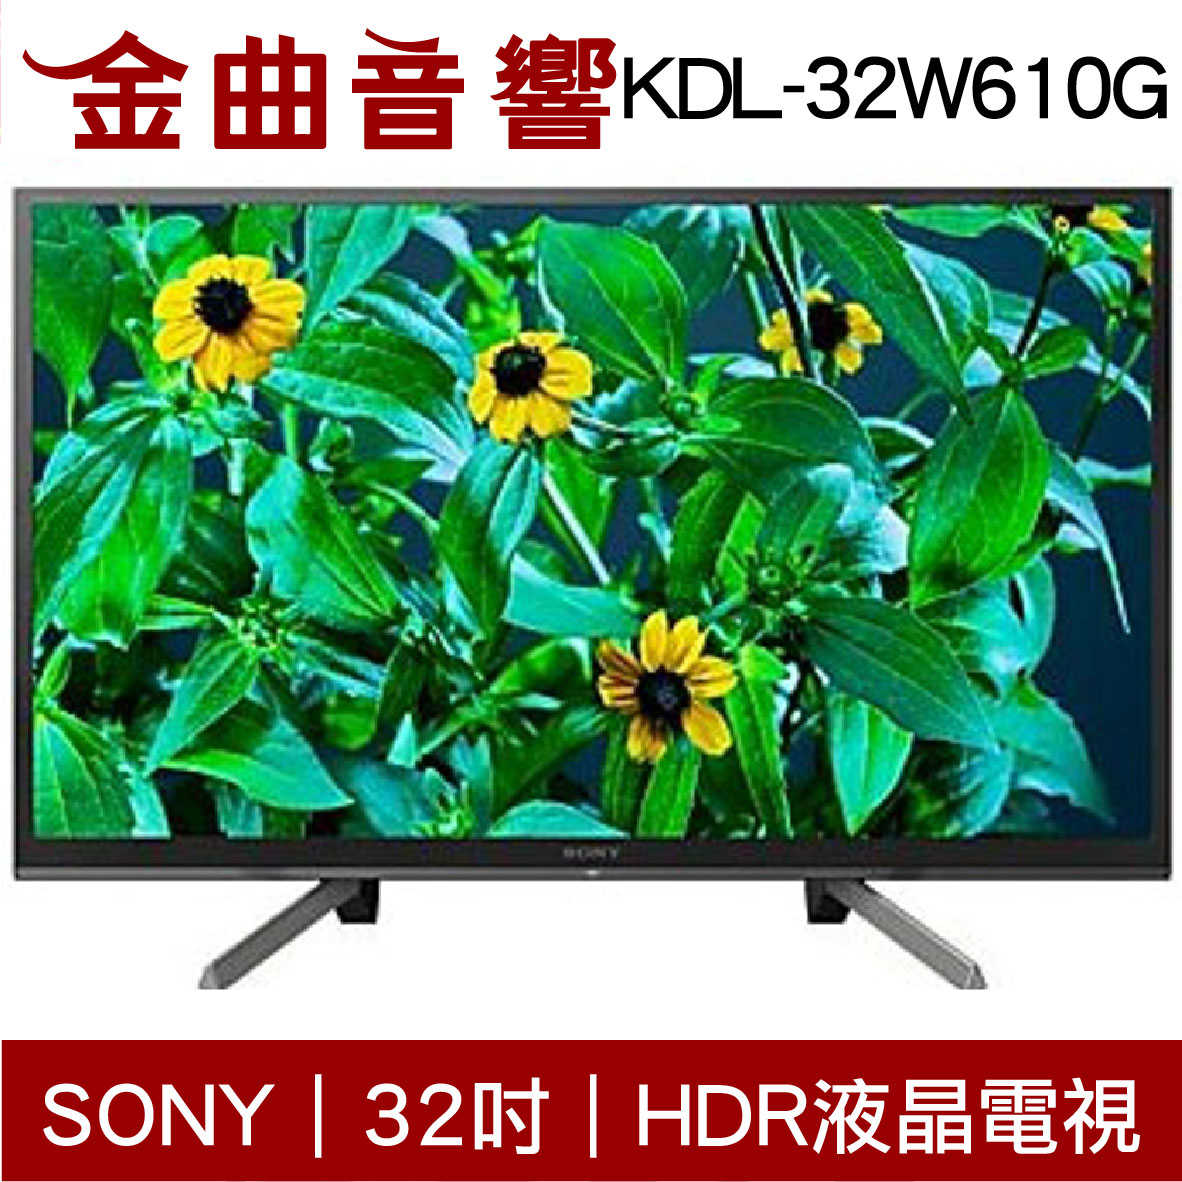 SONY 索尼 32吋 KDL-32W610G 液晶電視 2019   金曲音響